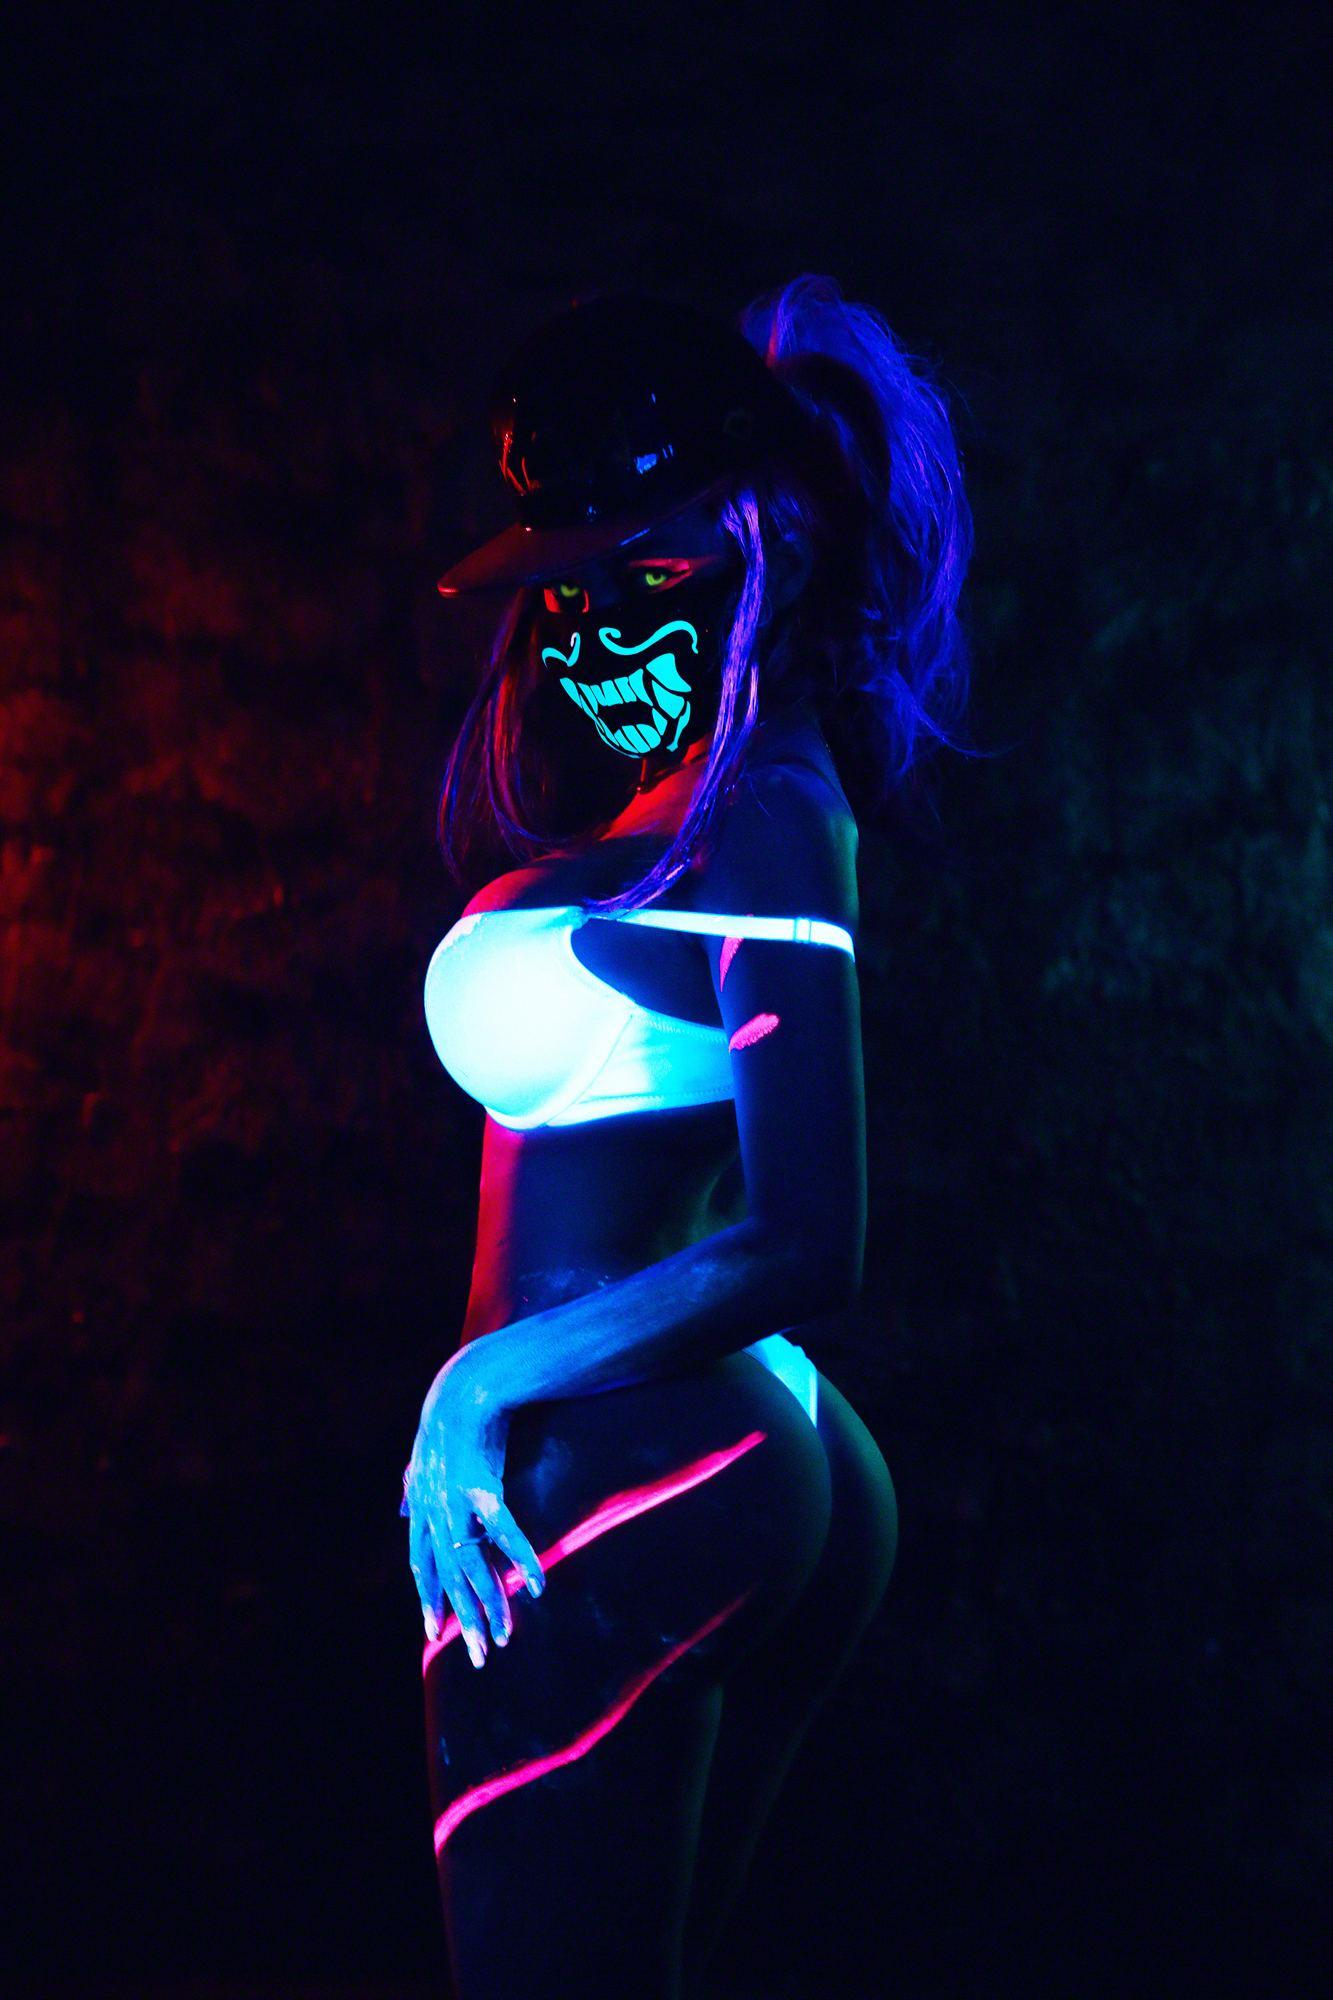 Kalinka Fox Nude Akali Cosplay Leaked 25